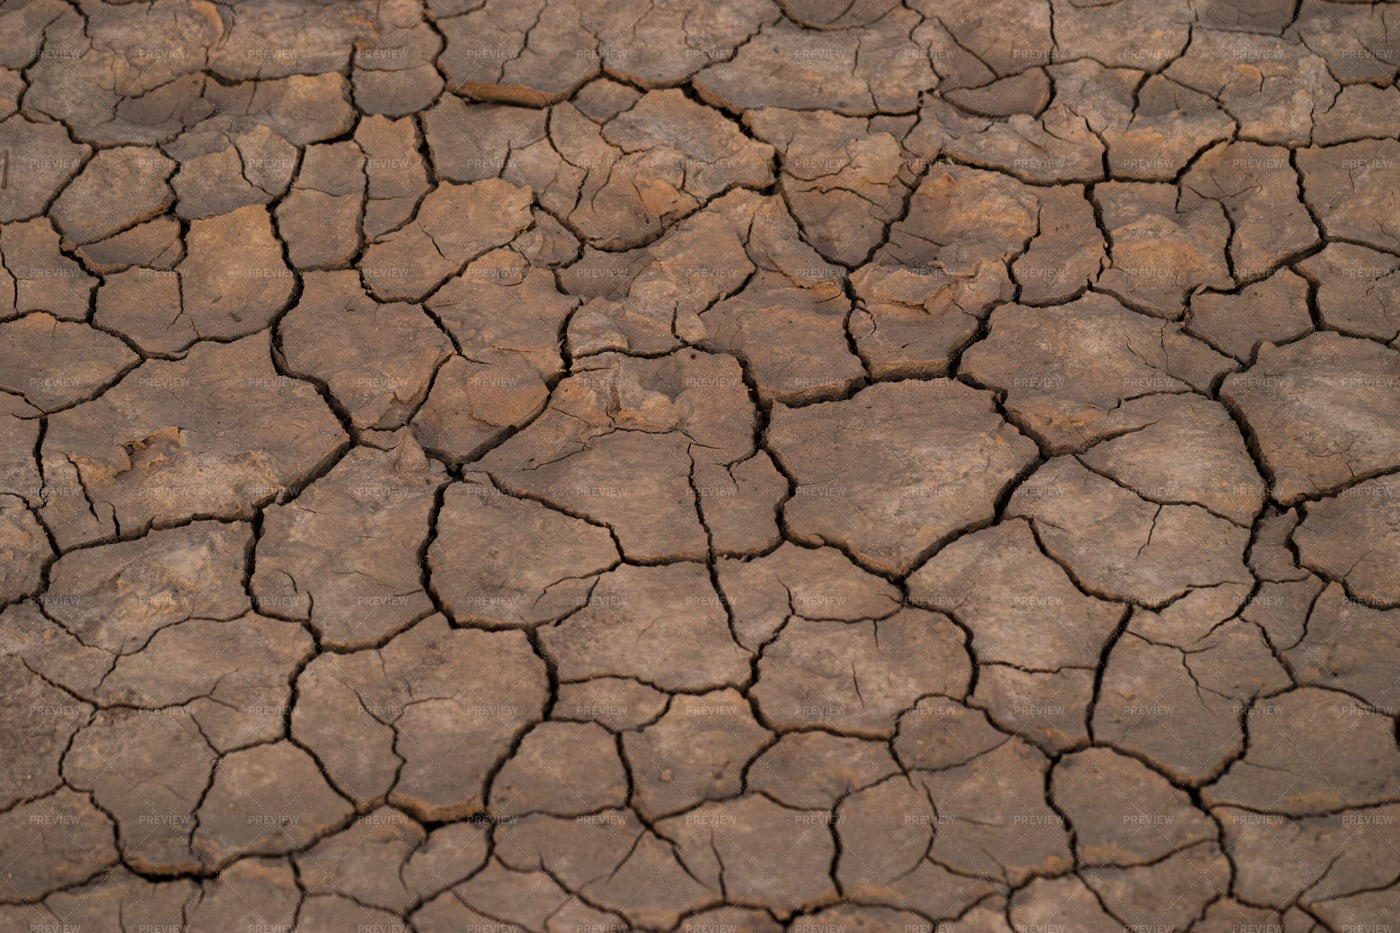 Dry Soil: Stock Photos